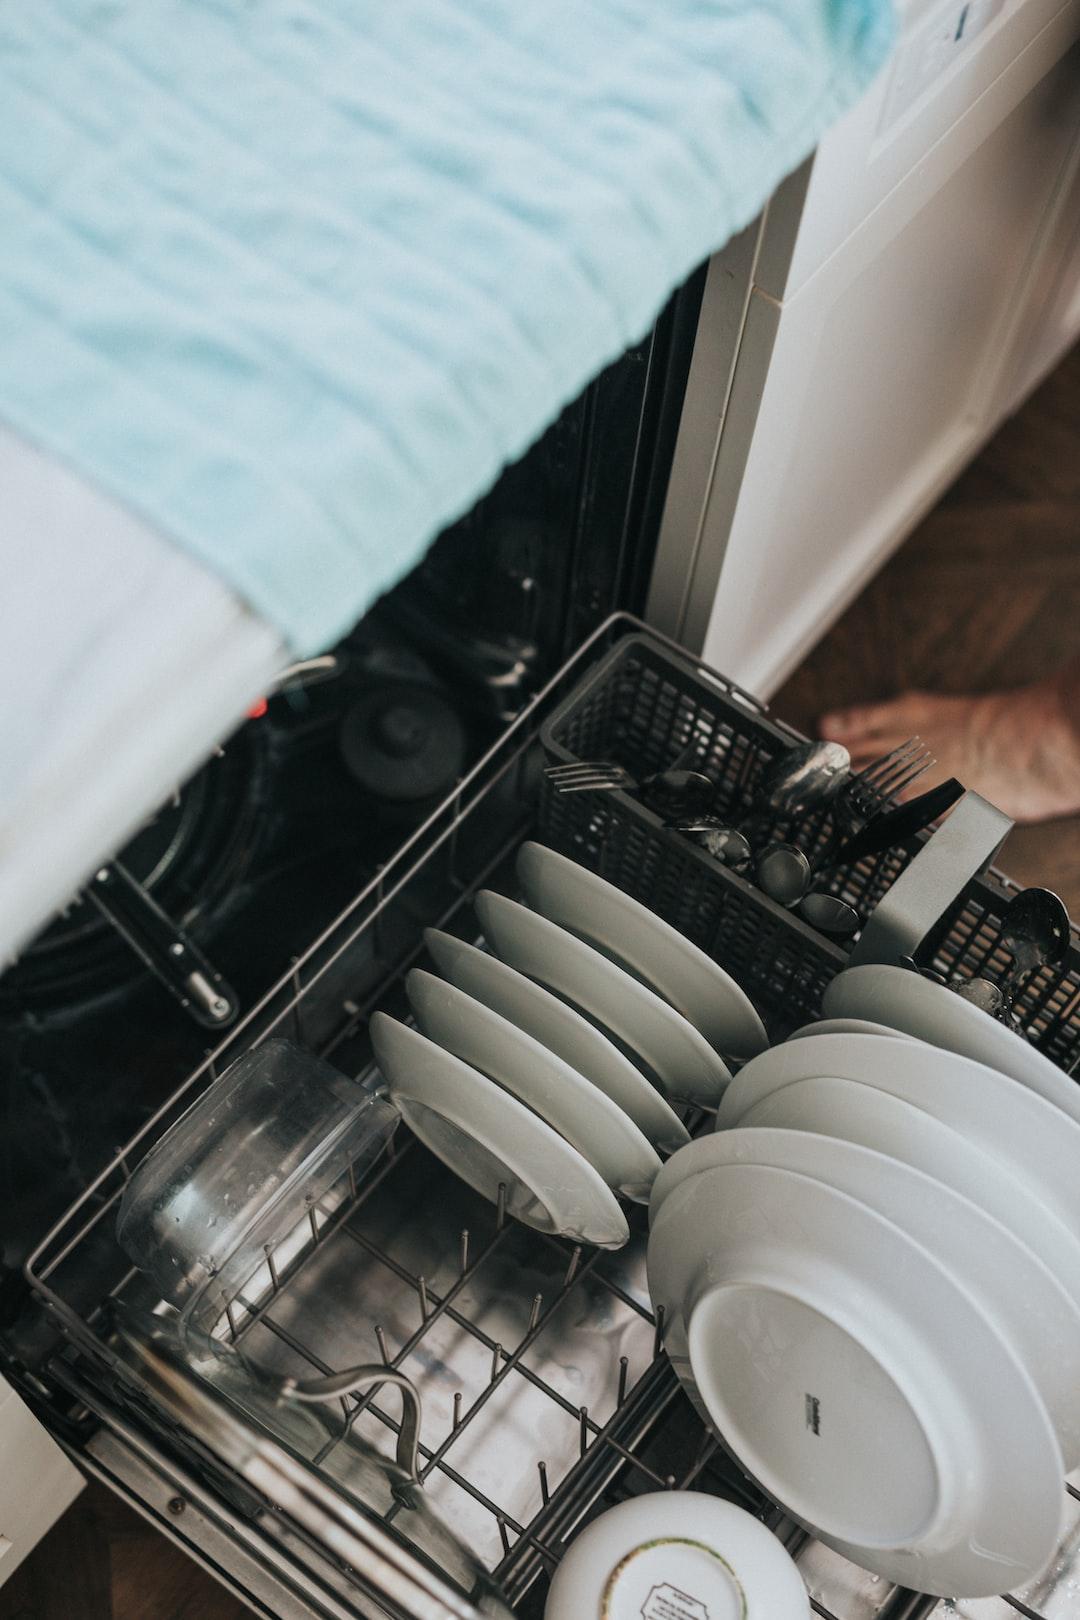 Geschirrspülmaschine wäscht nicht sauber